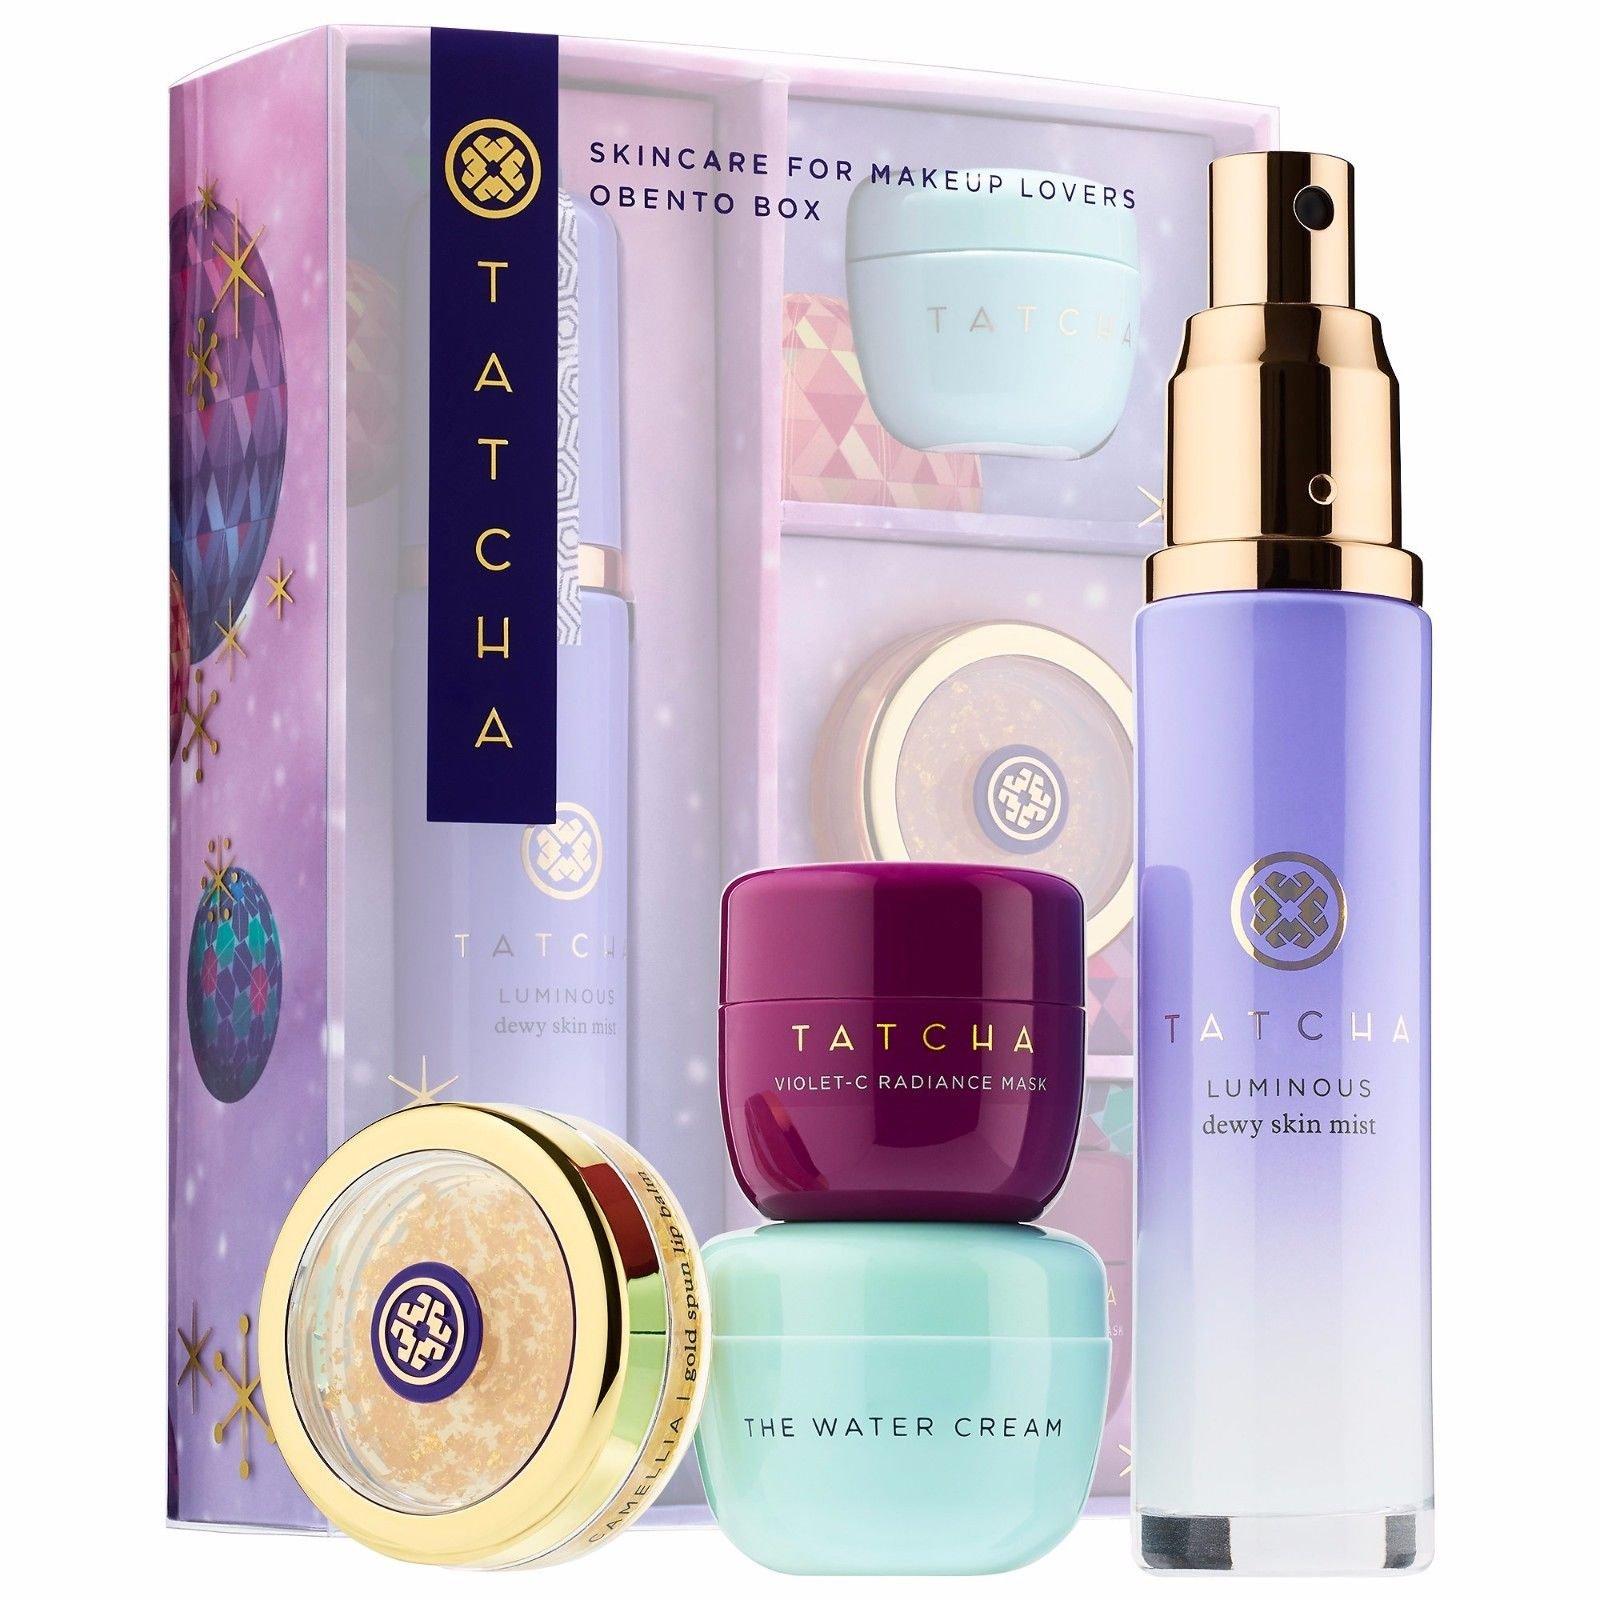 TATCHA Skincare for Makeup Lovers Obento Set Box (4 Pieces Kit)